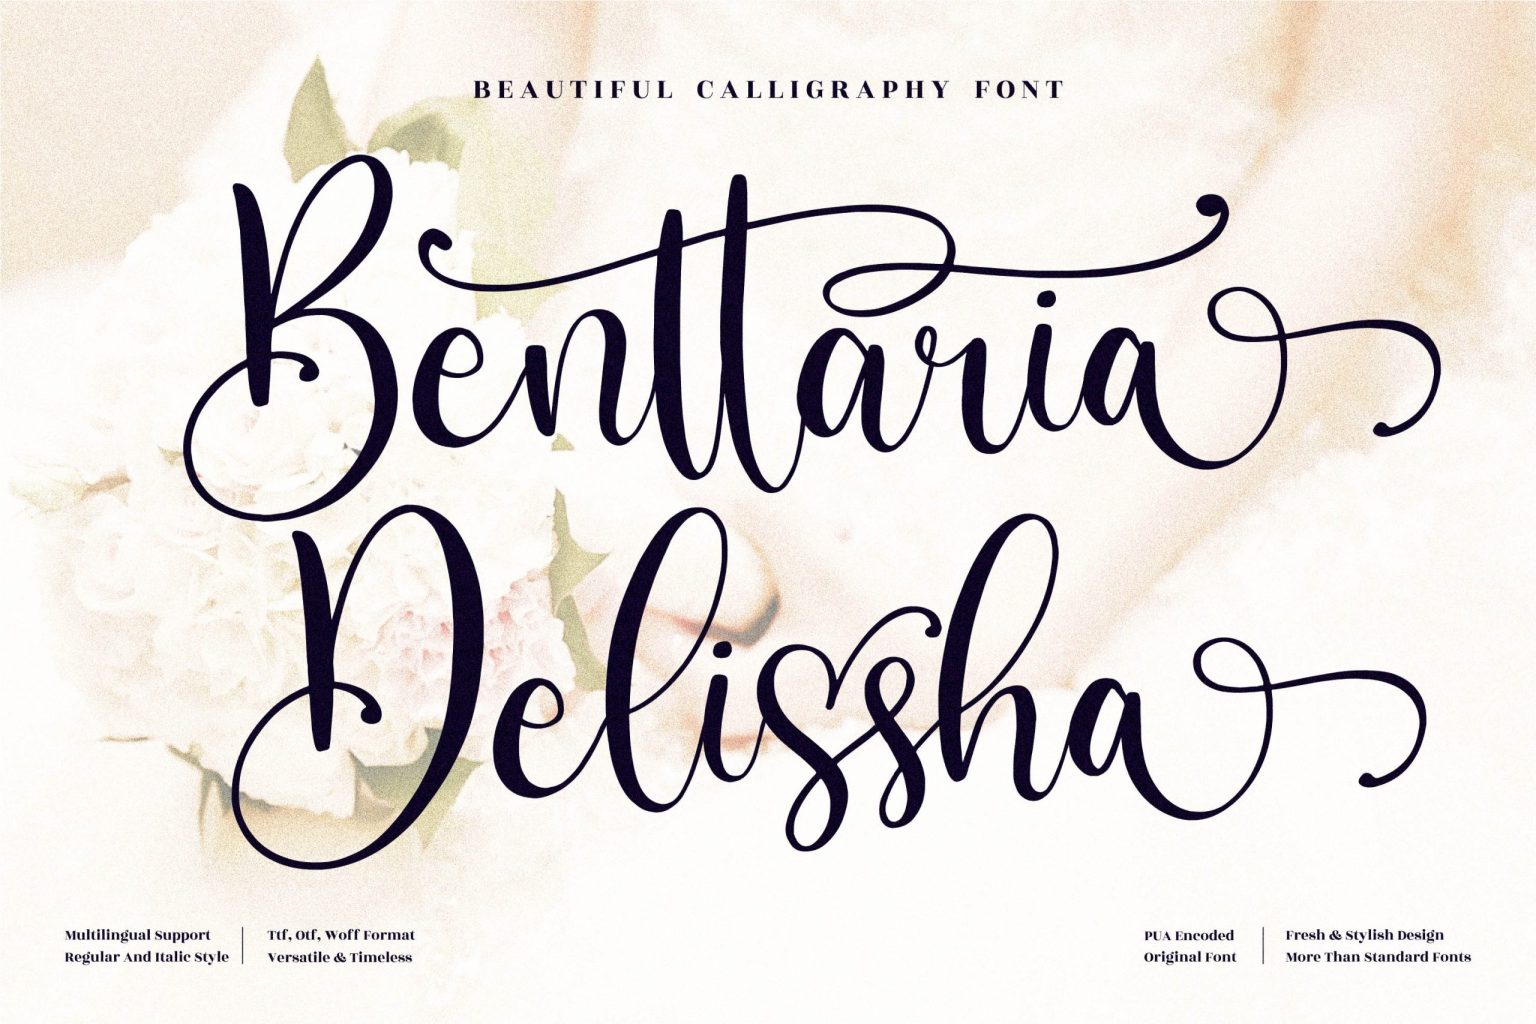 Benttaria Delissha Calligraphy Font